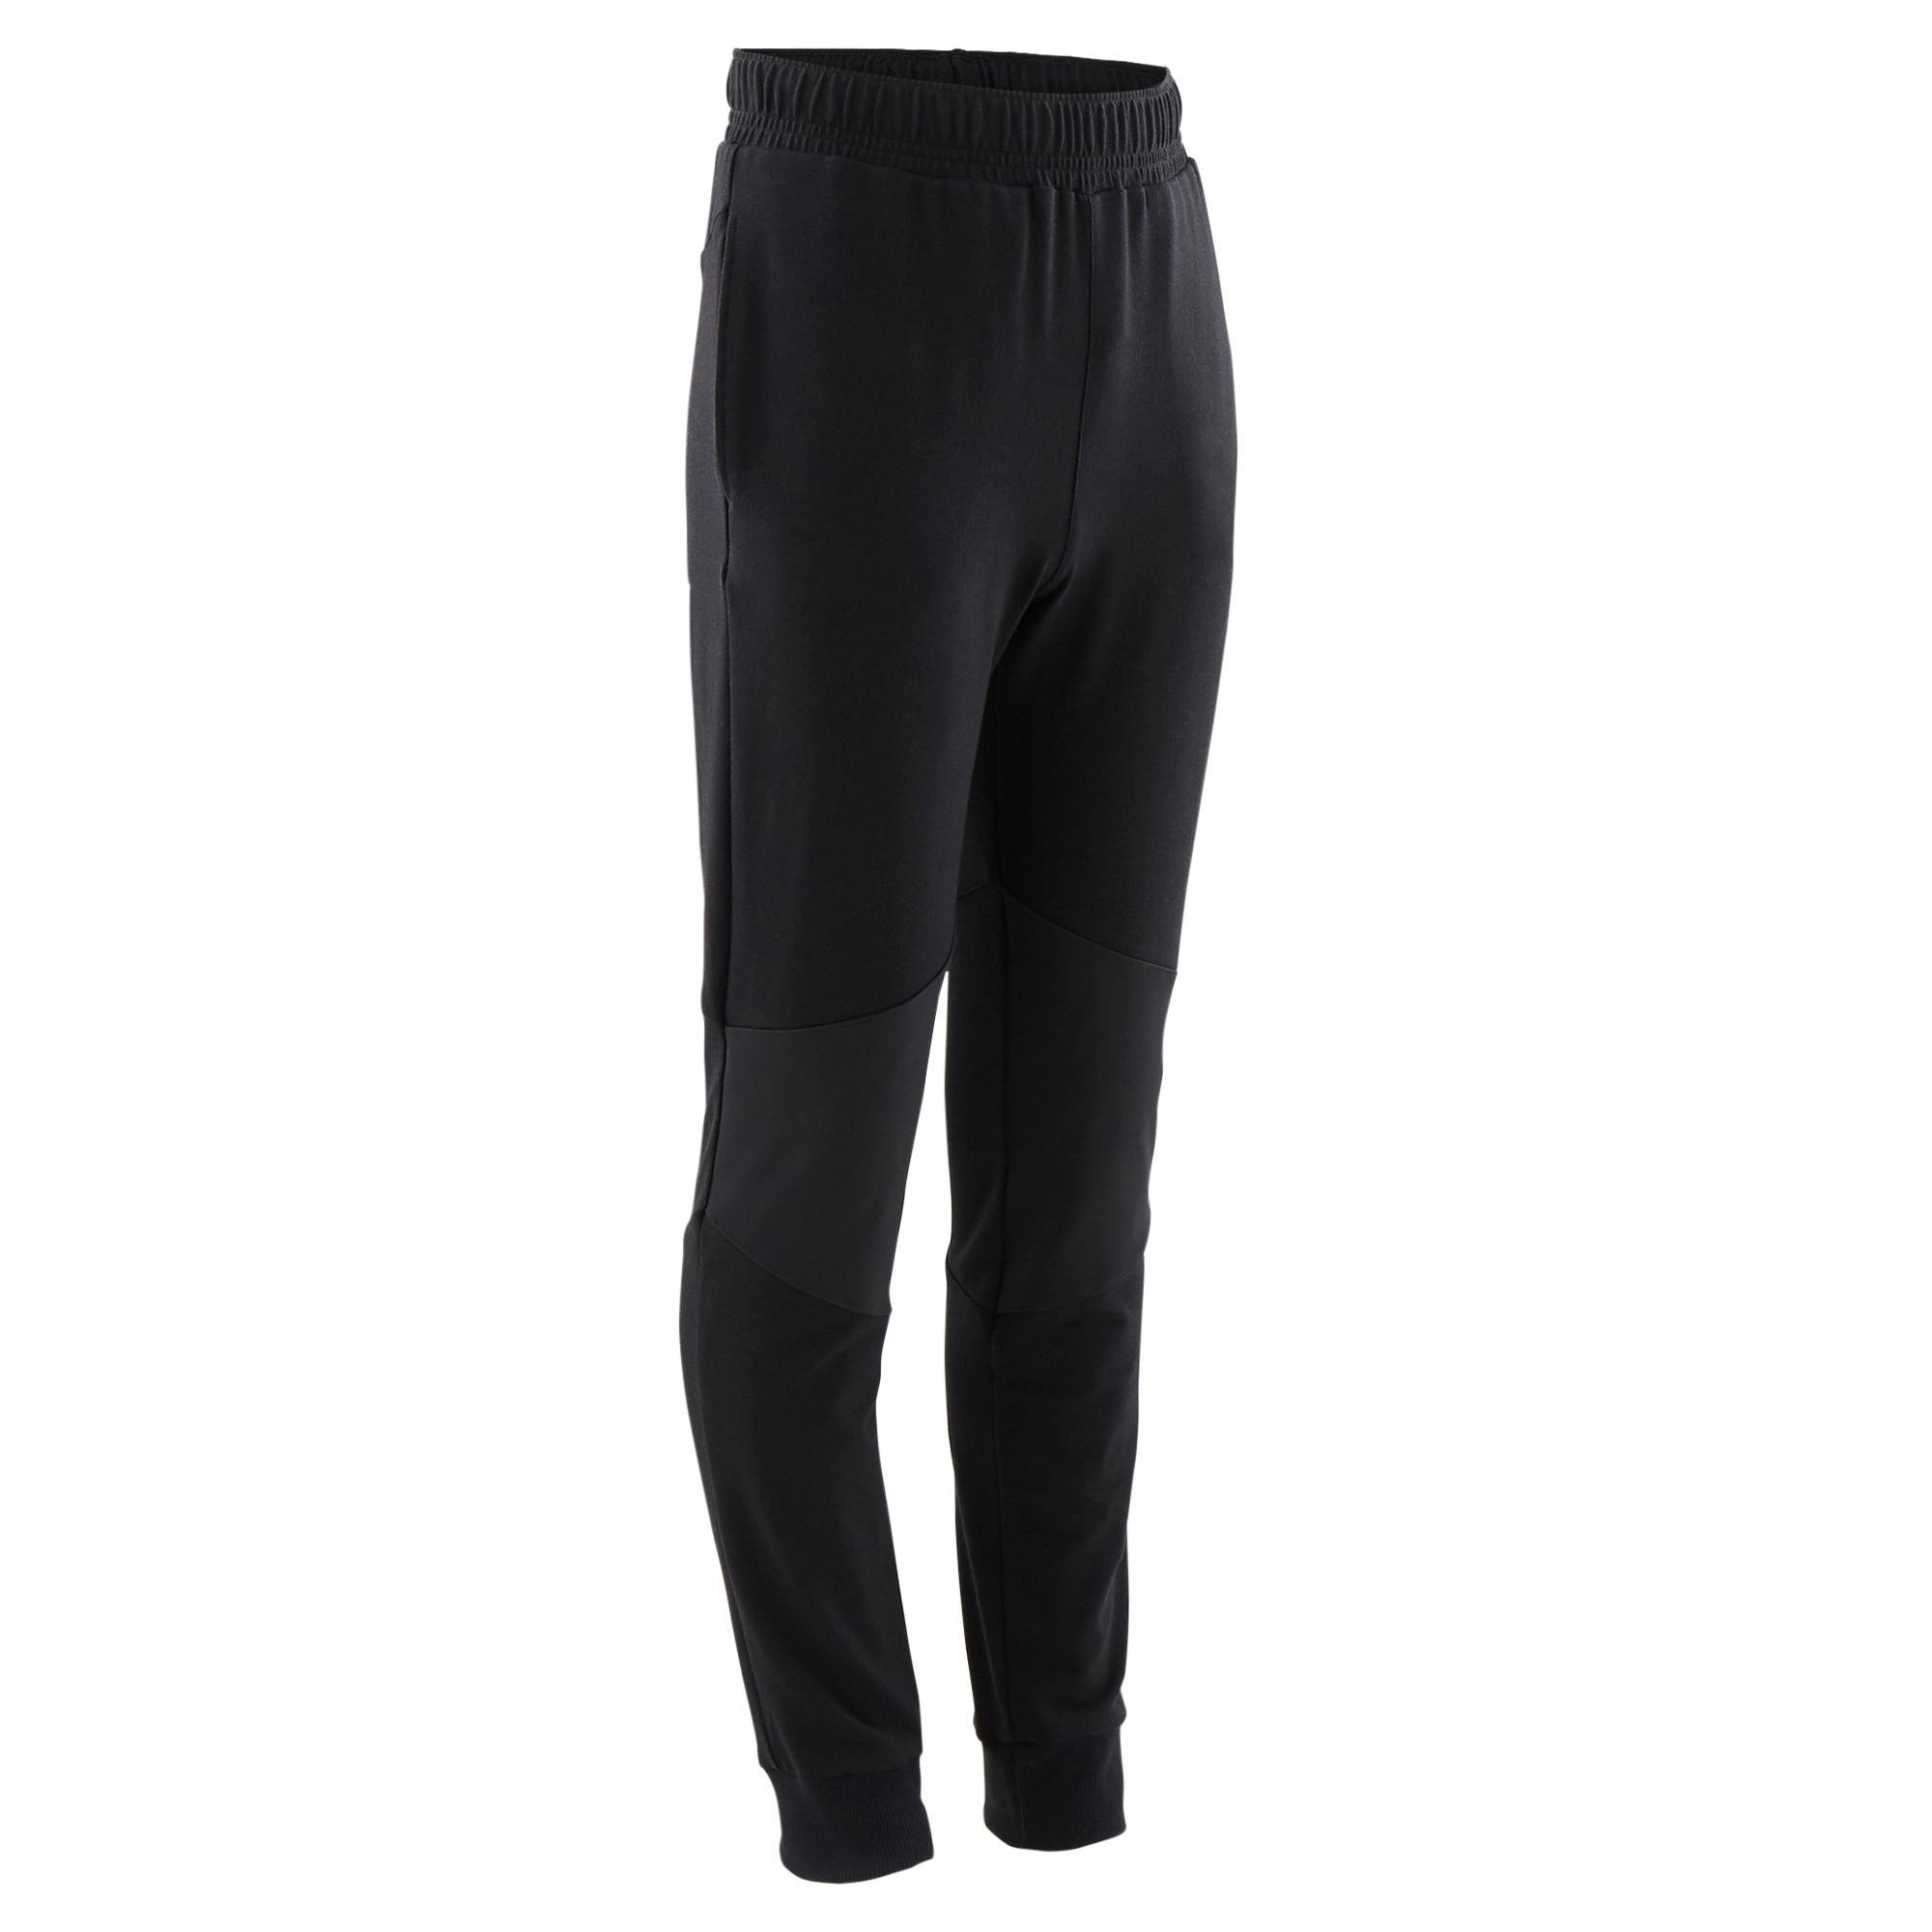 Pantalon slim 500 negru băieți la Reducere poza